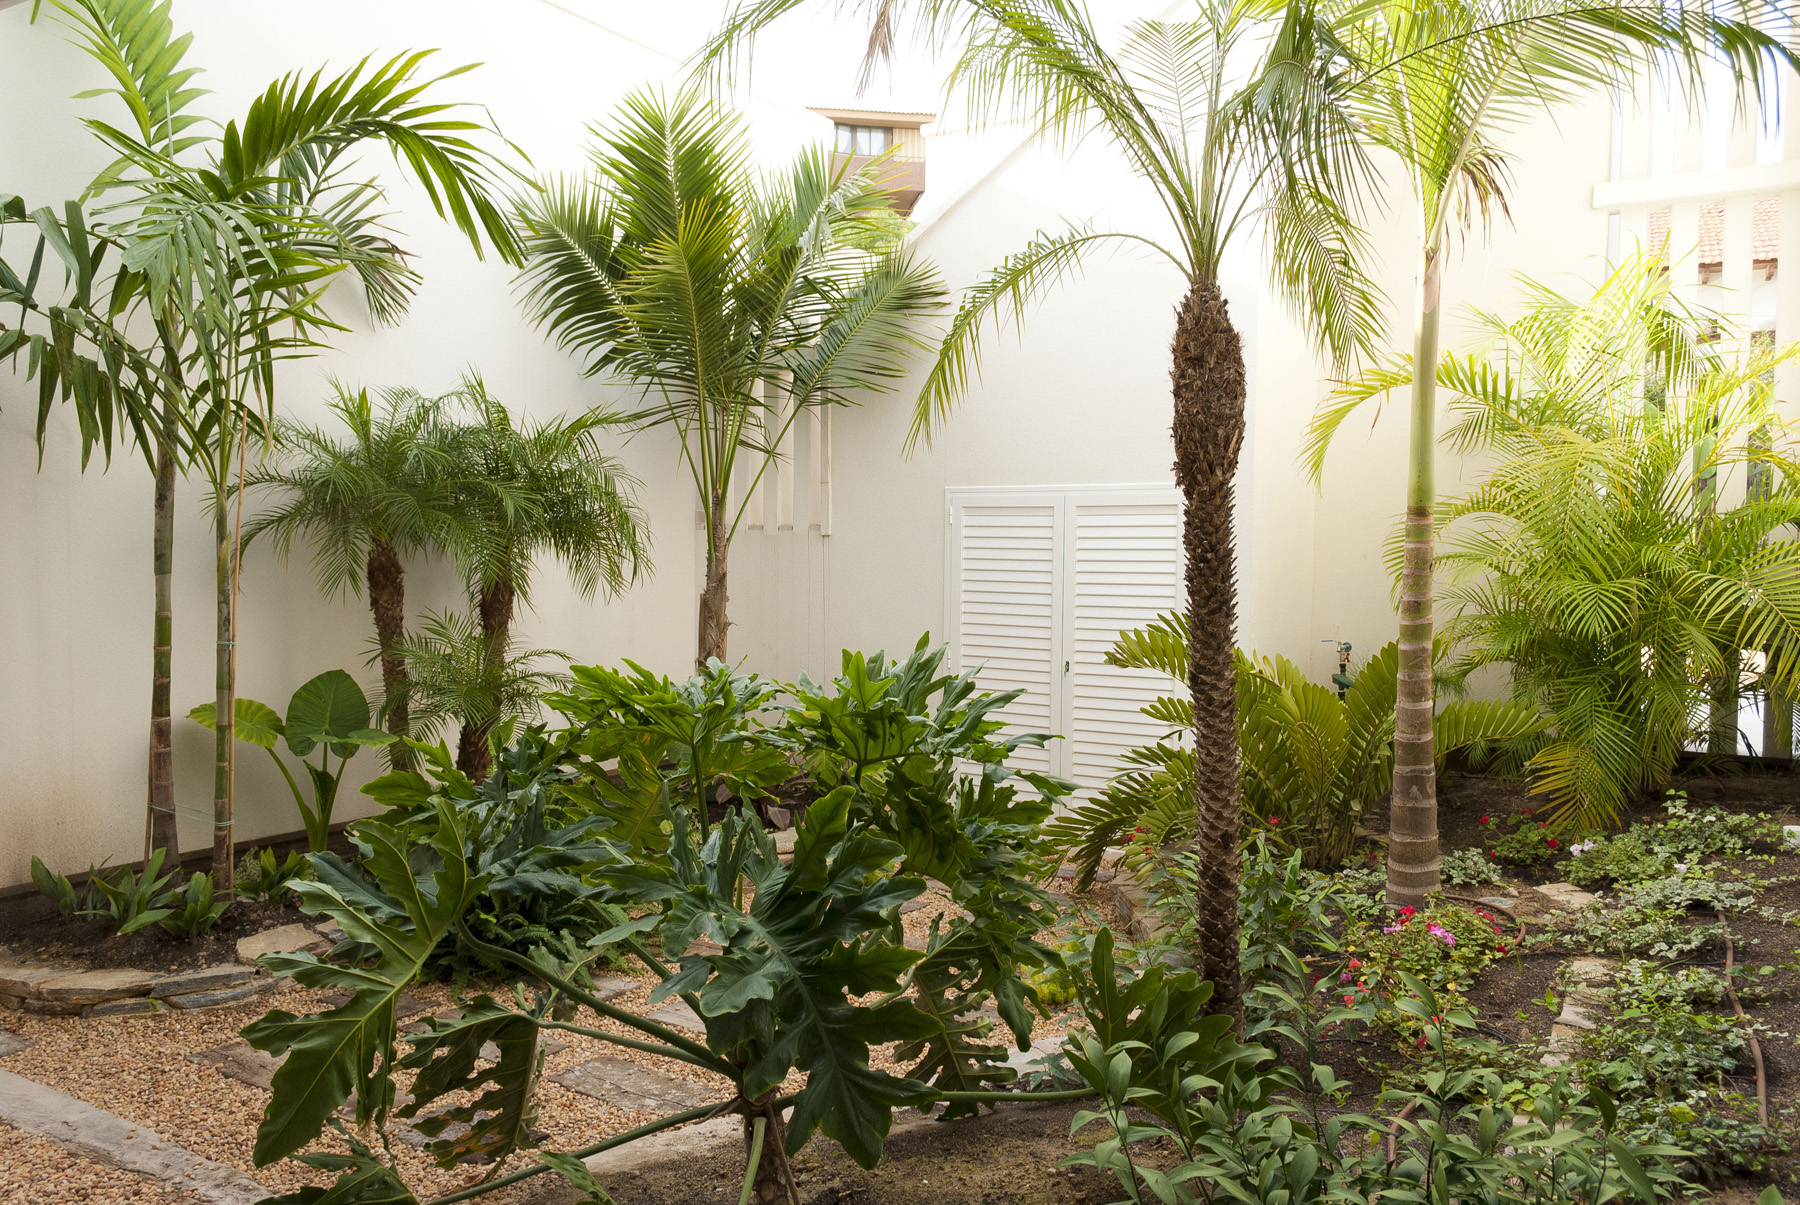 Diseno de jardin peque o david jim nez arquitectura y - Diseno jardines madrid ...